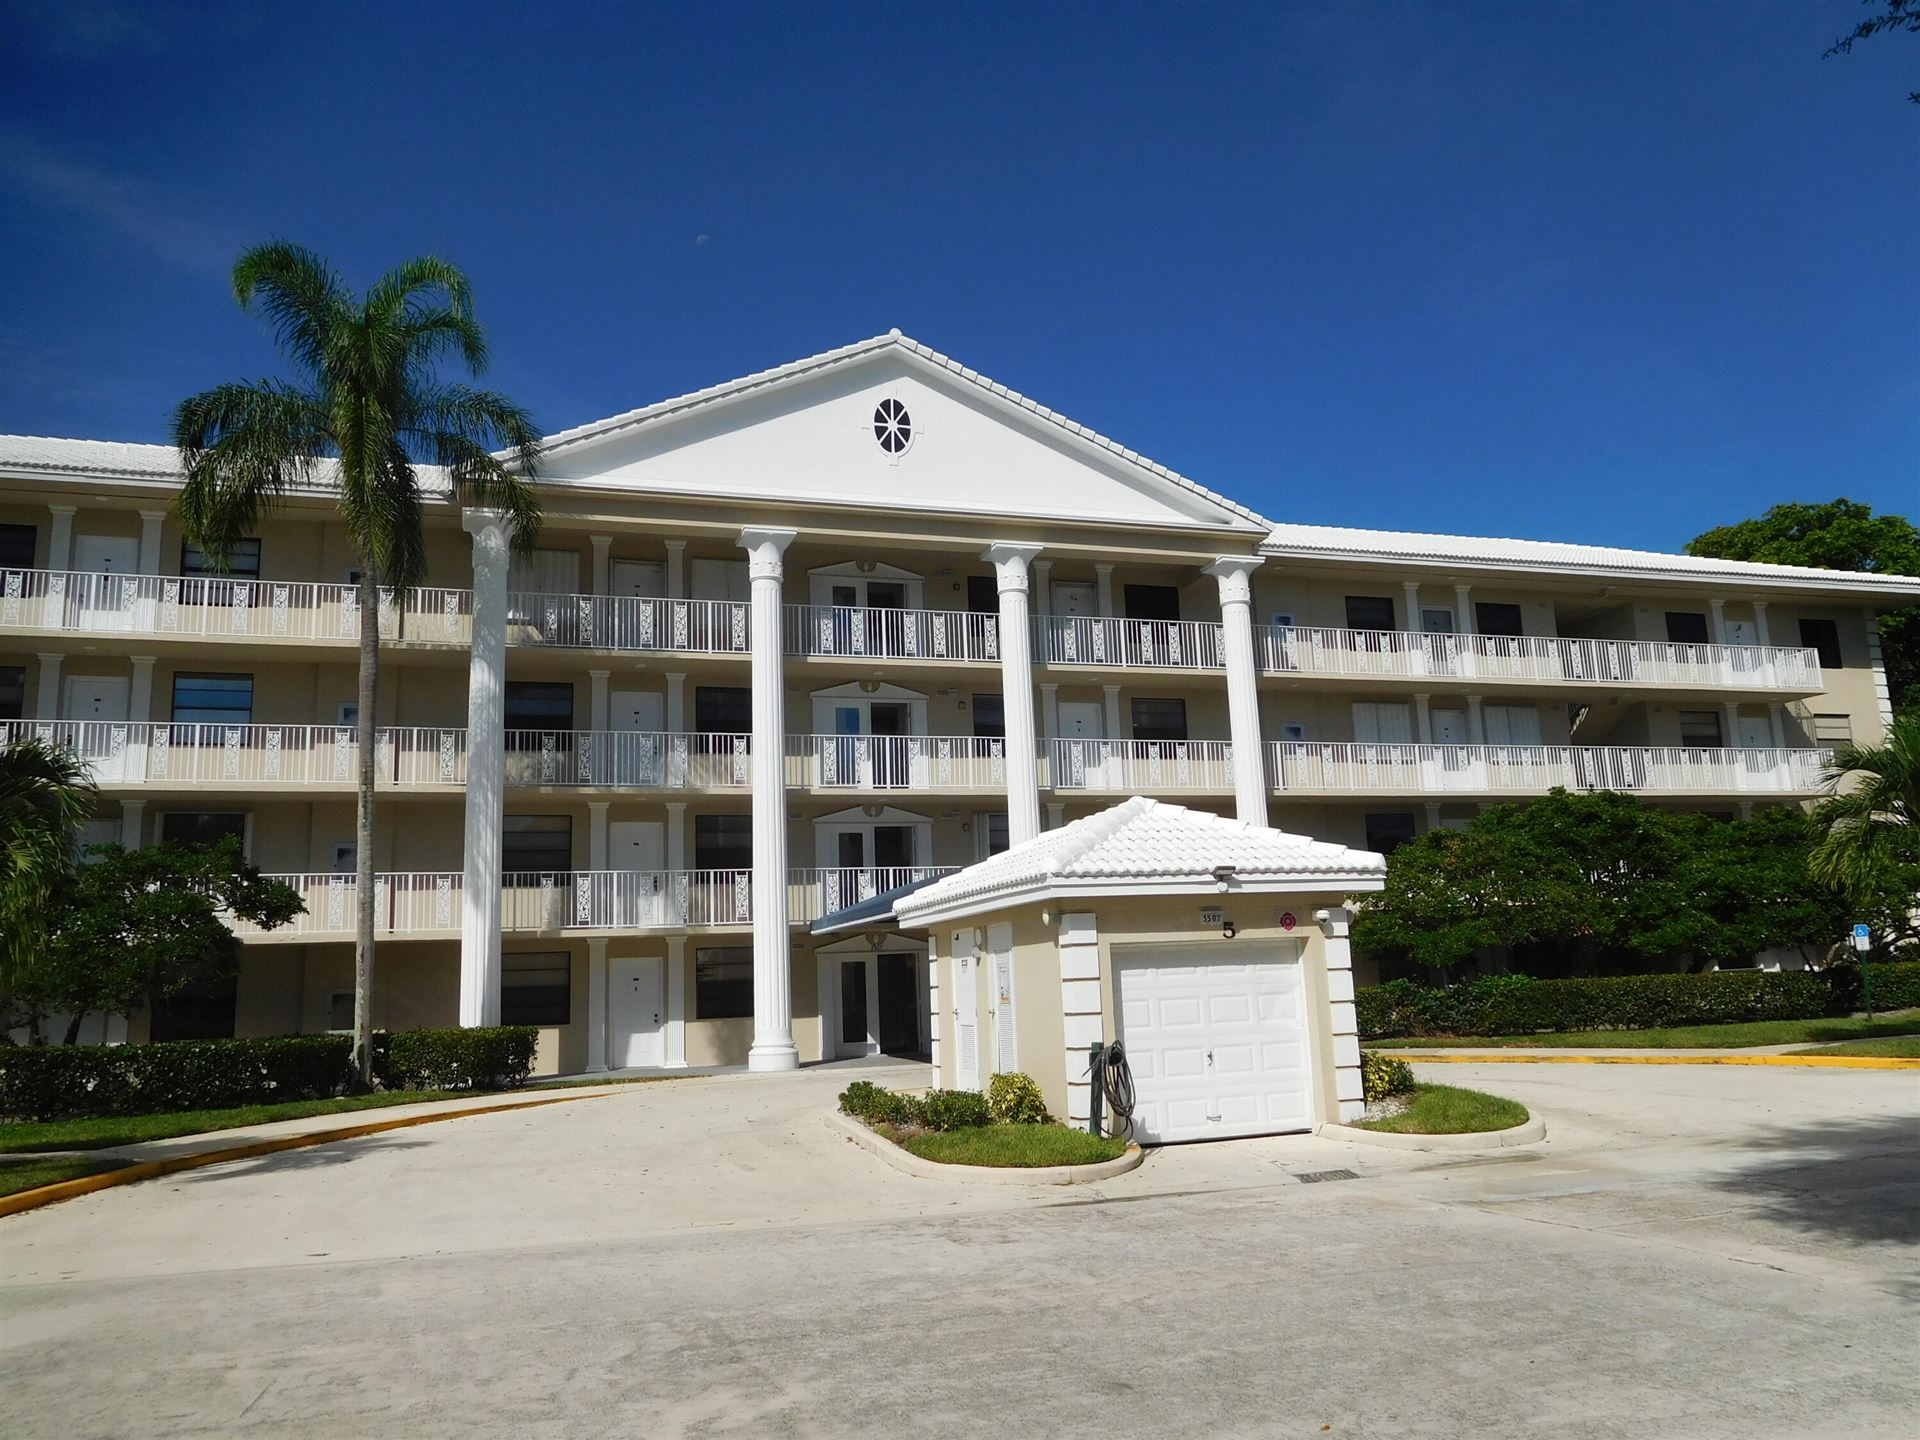 3507 Village Boulevard #401, West Palm Beach, FL 33409 - MLS#: RX-10754996